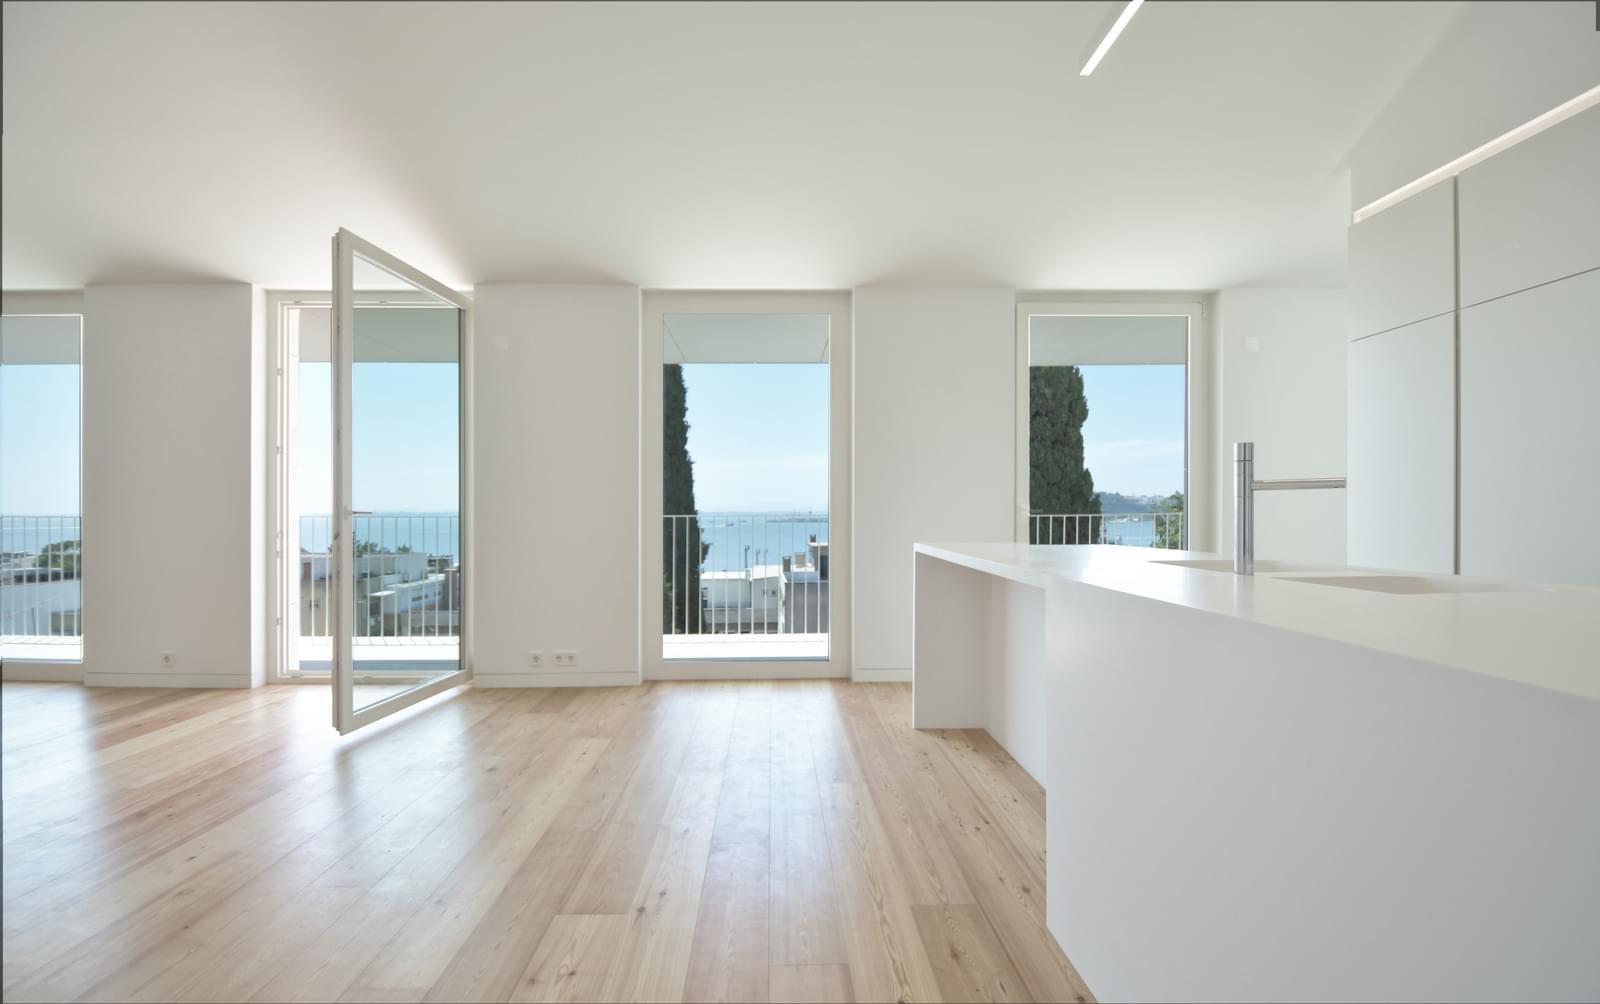 pf18051-apartamento-t4-lisboa-01eadd62-ce74-4cde-b05a-280710ff6894